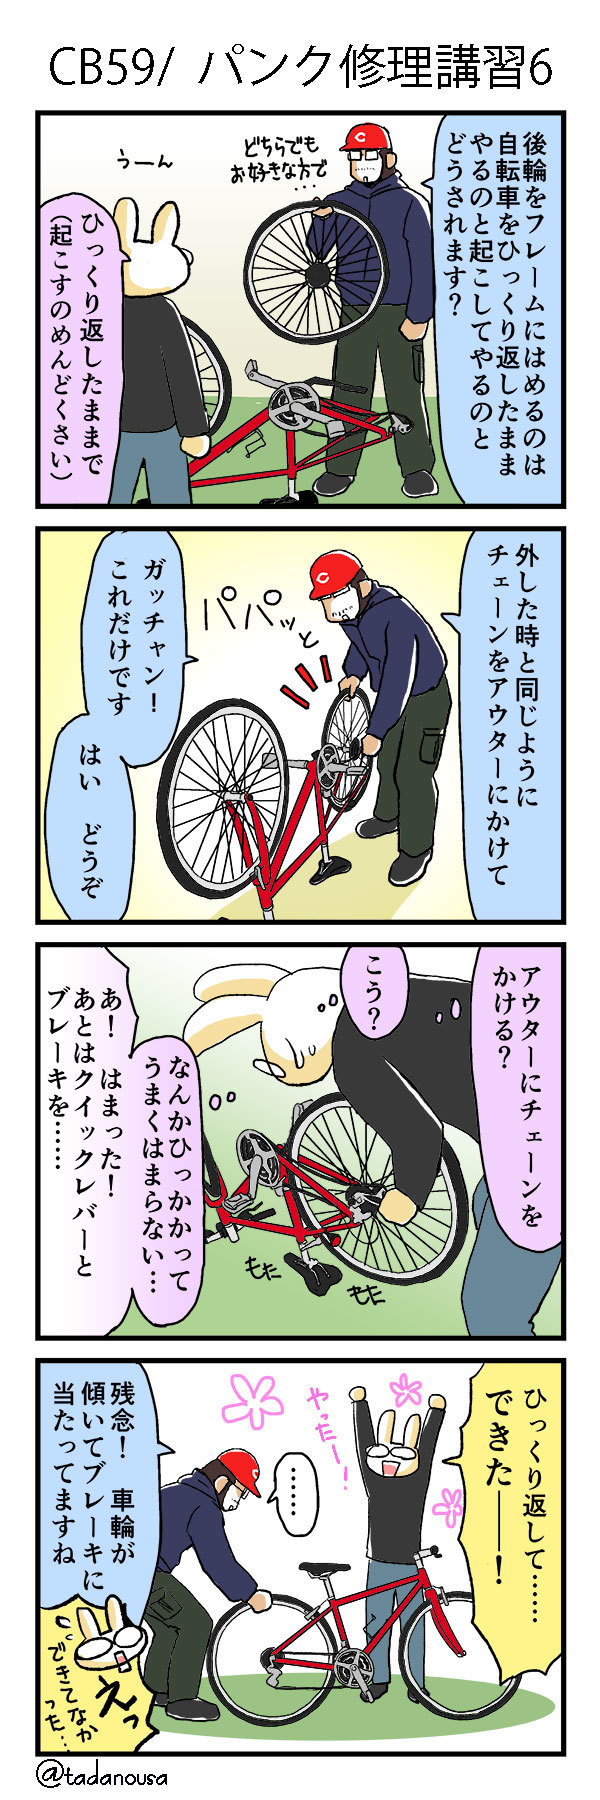 bike_4koma_kako099_s.jpg